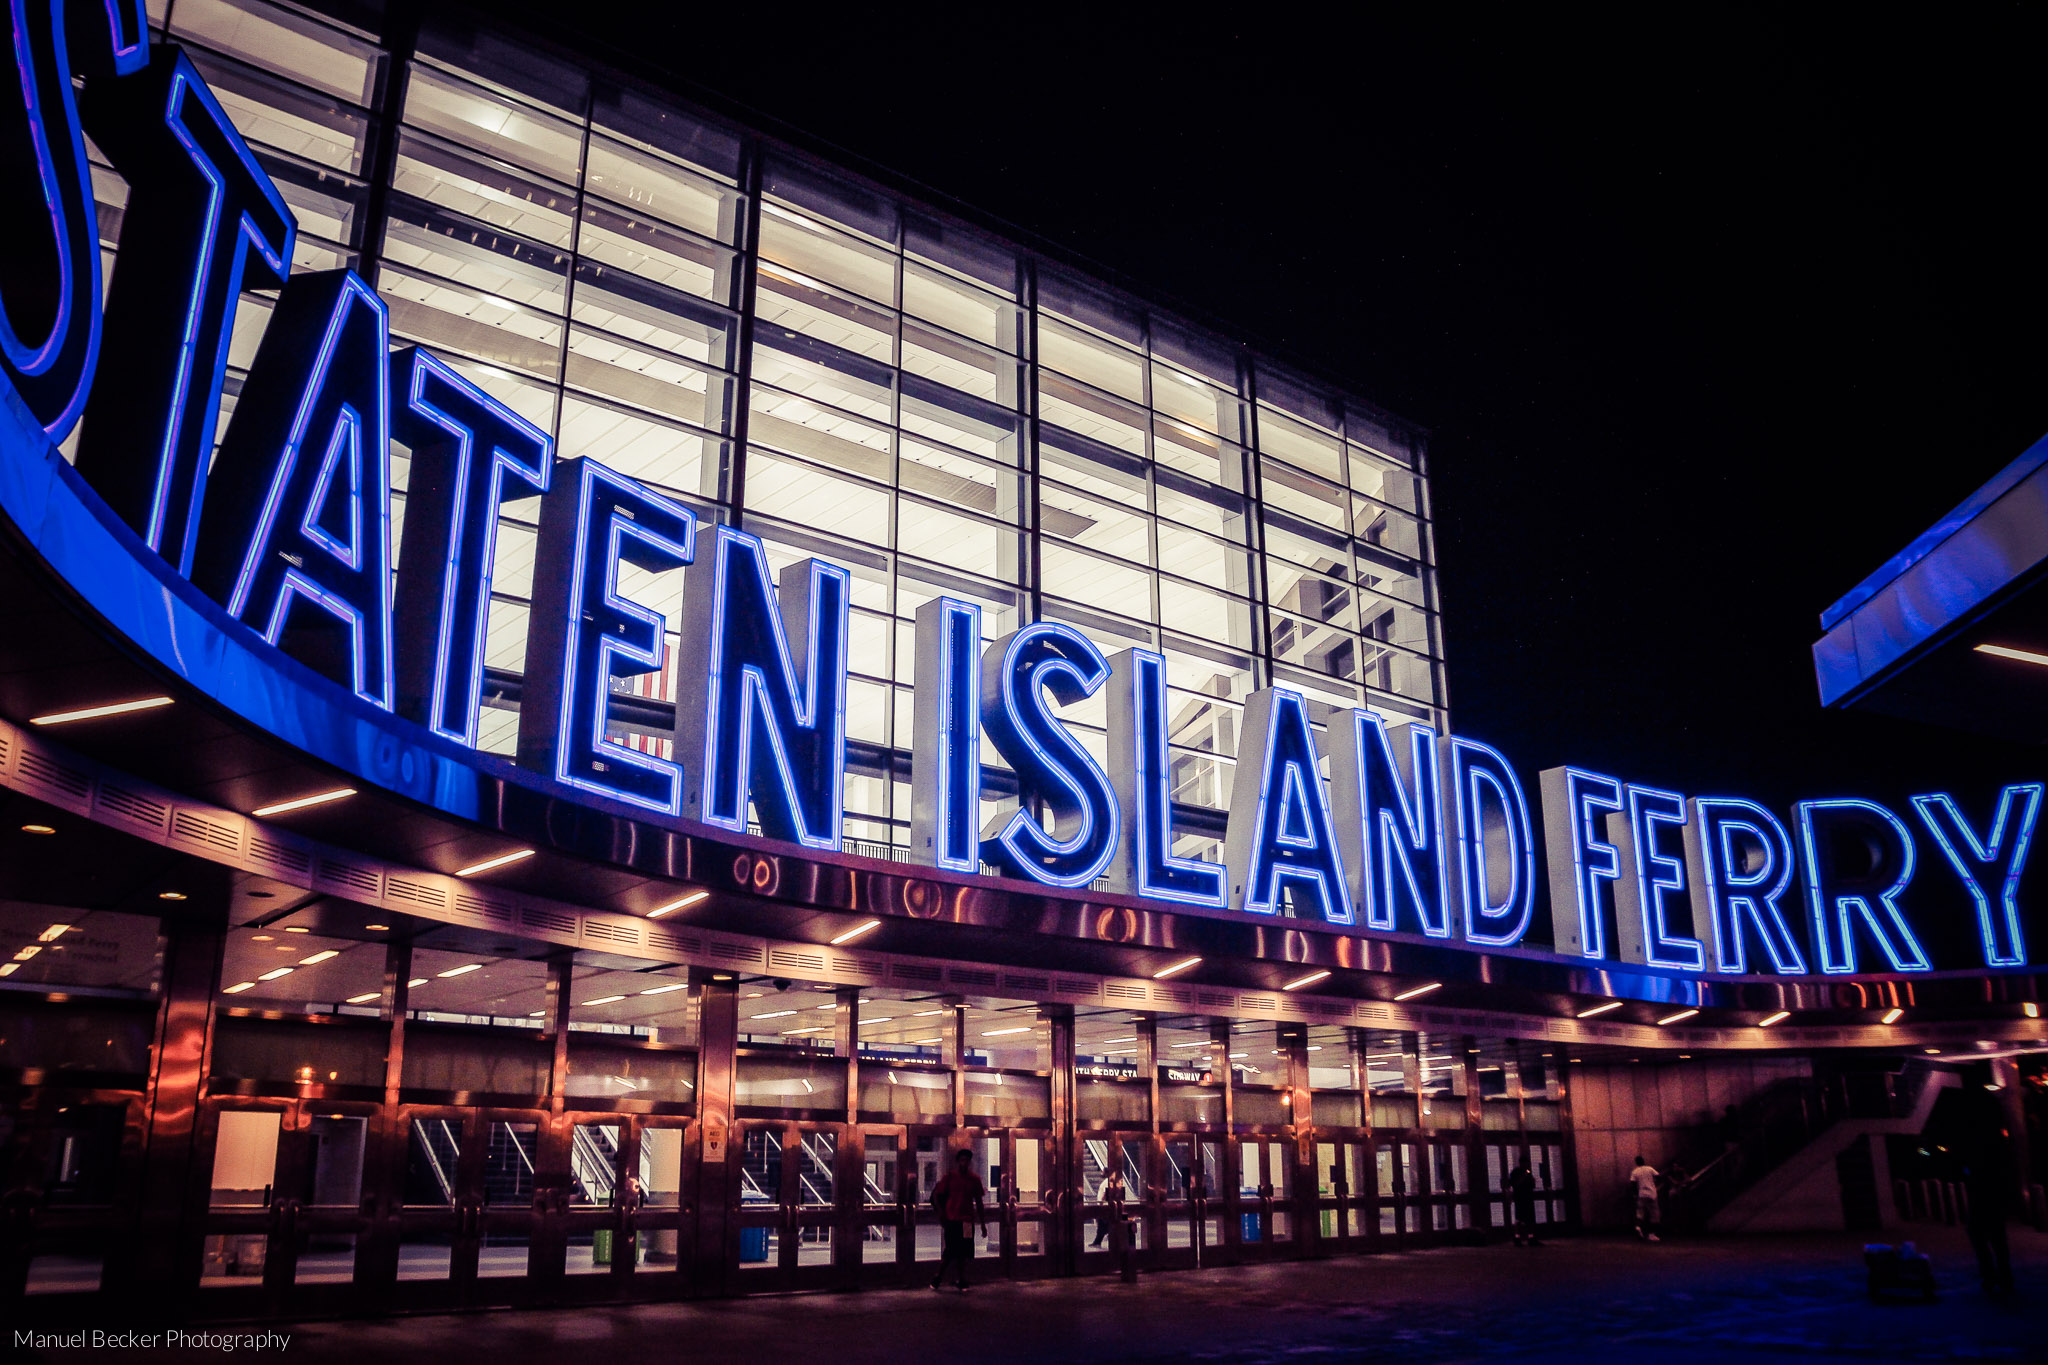 Staten Island Ferry, New York, USA